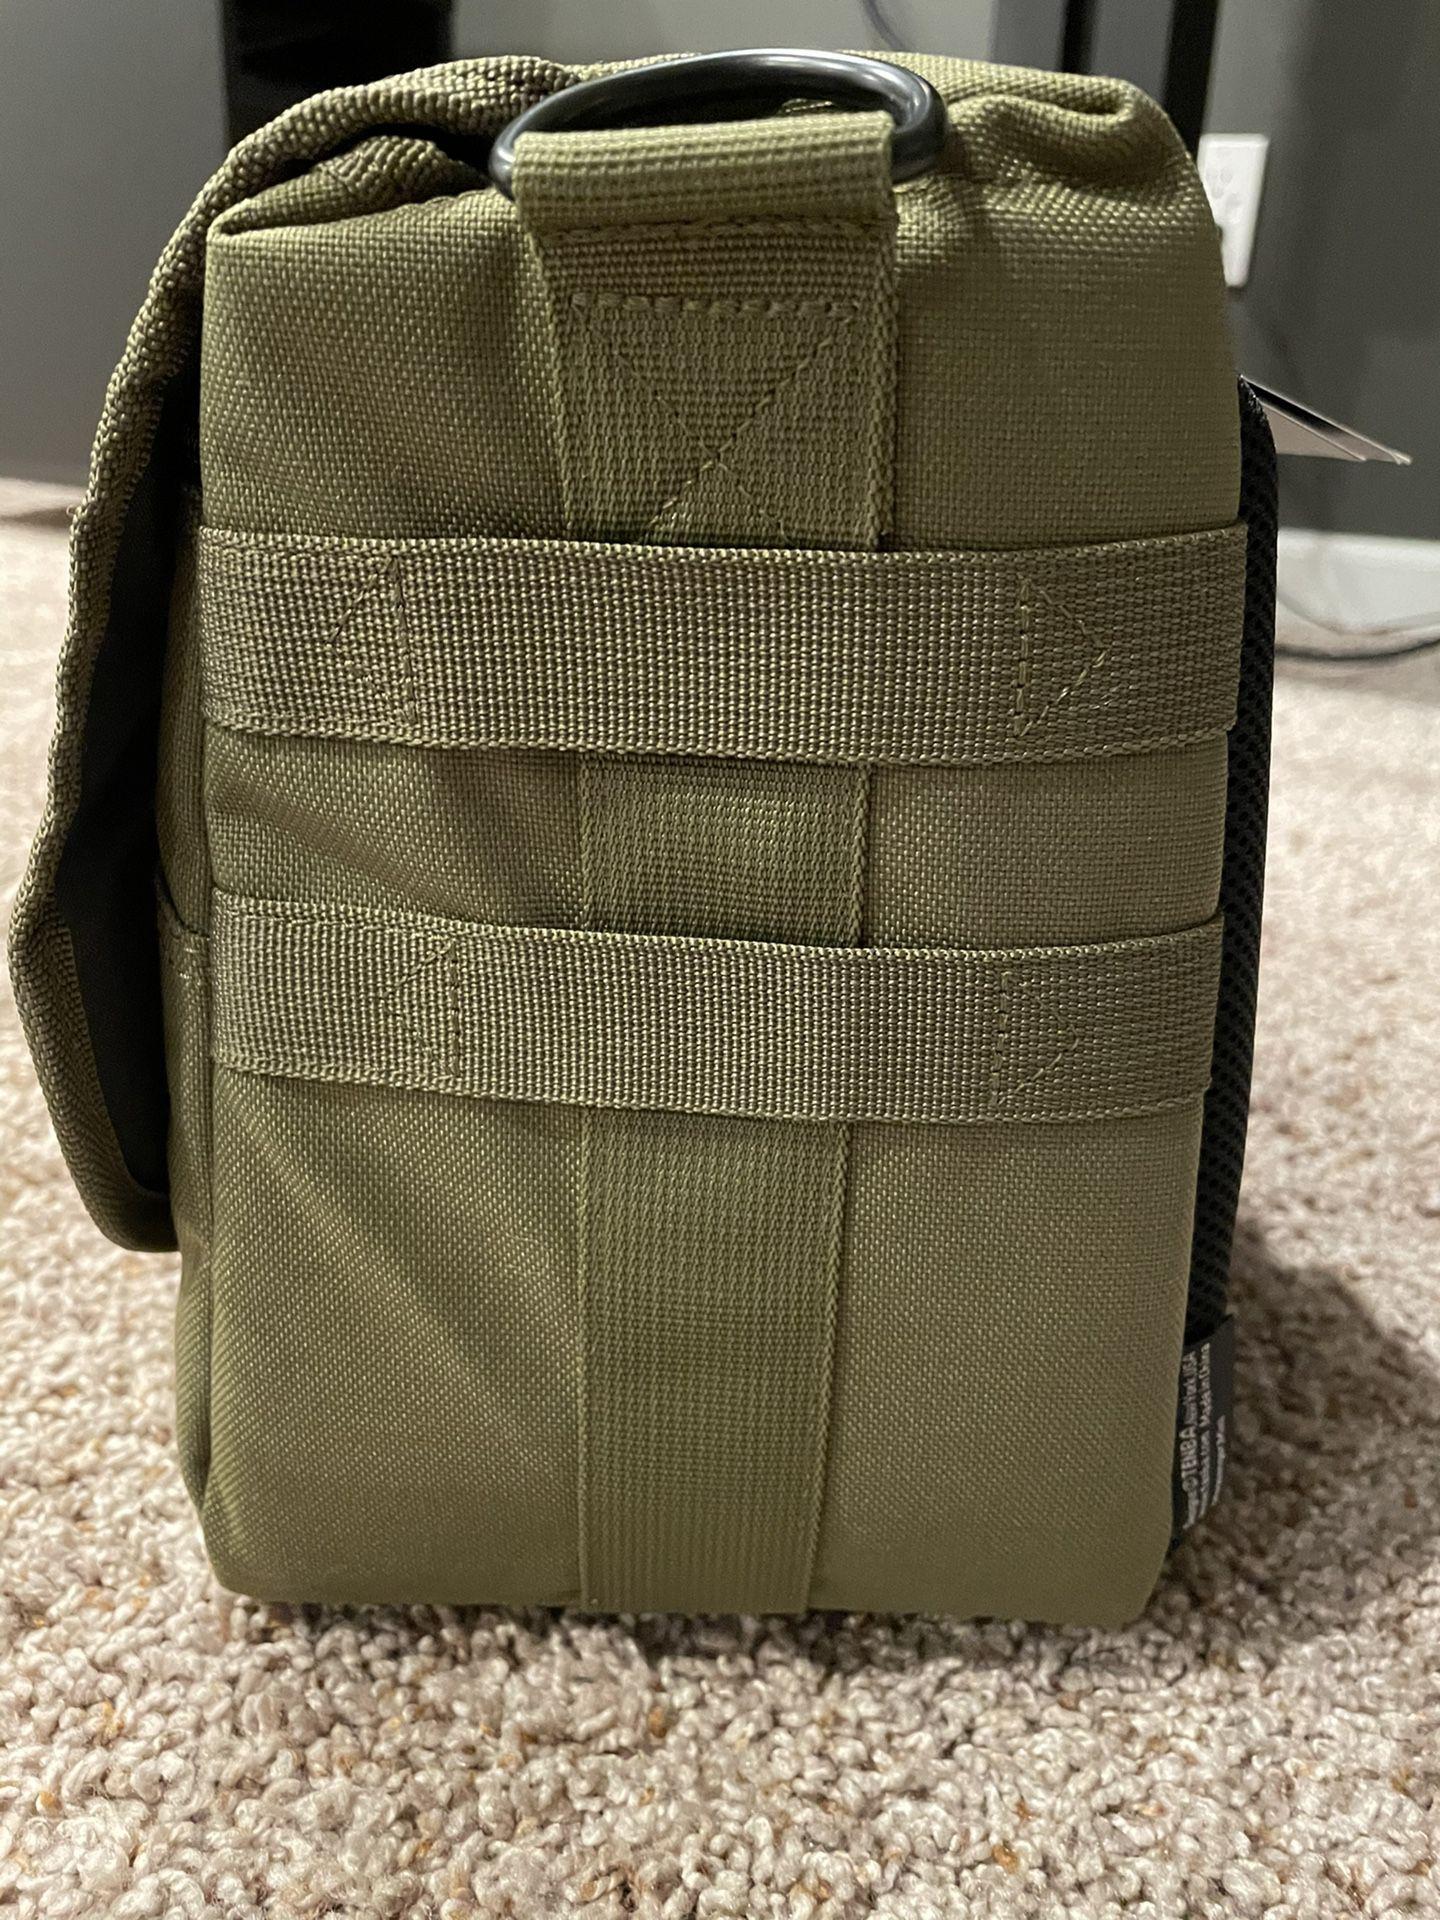 NEW Tenba mini messenger camera/laptop bag